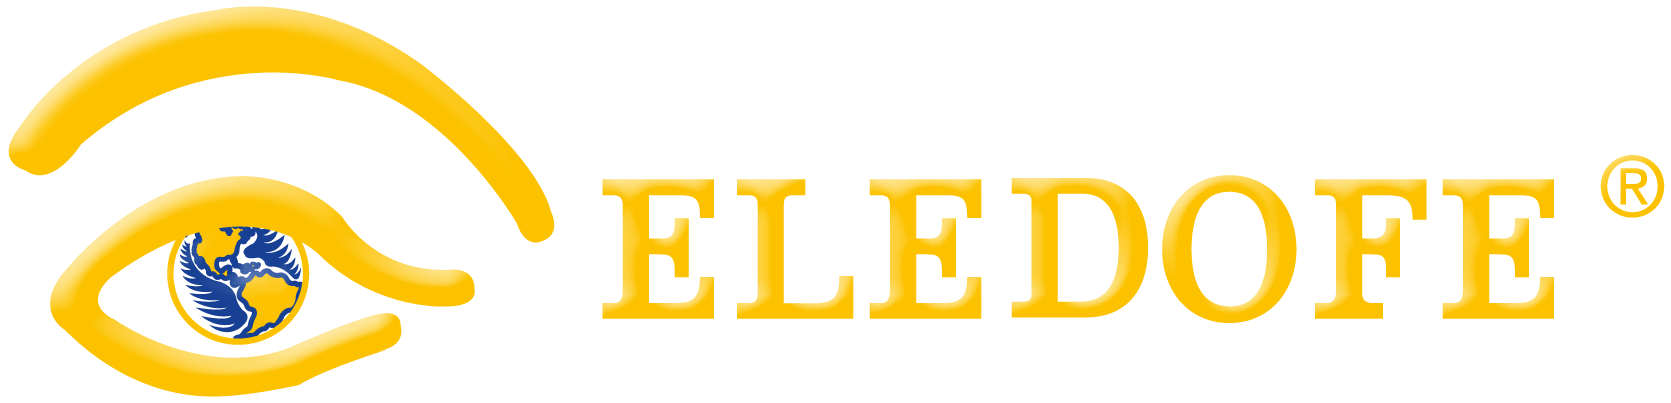 Eledofe